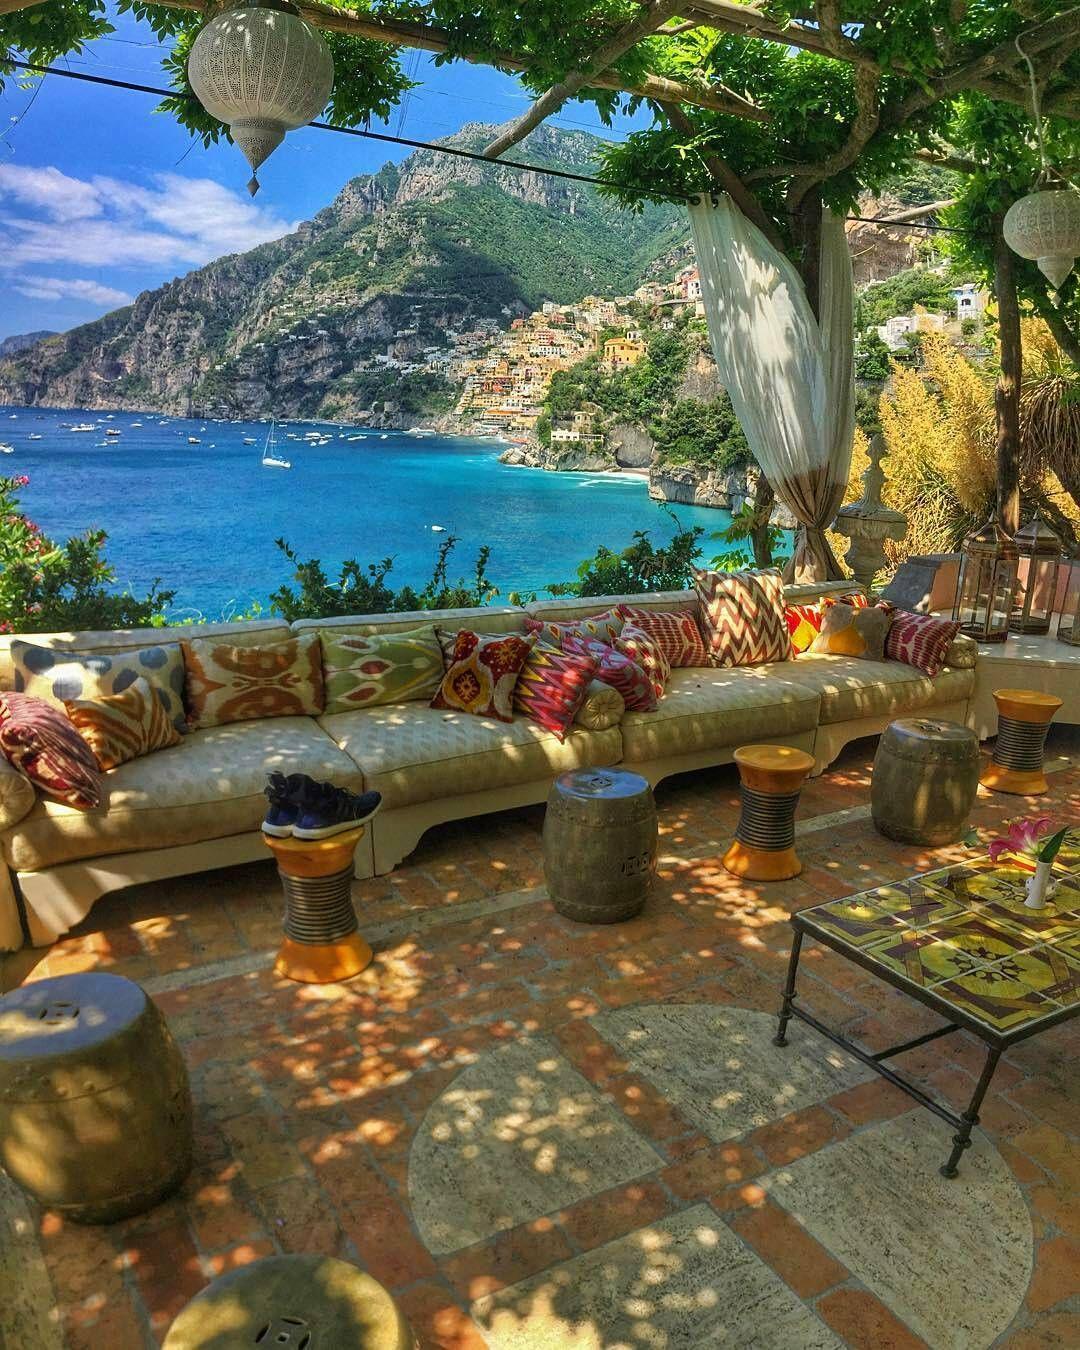 """Villa Treville Positano Italy #Positano #italy #villatreville"""